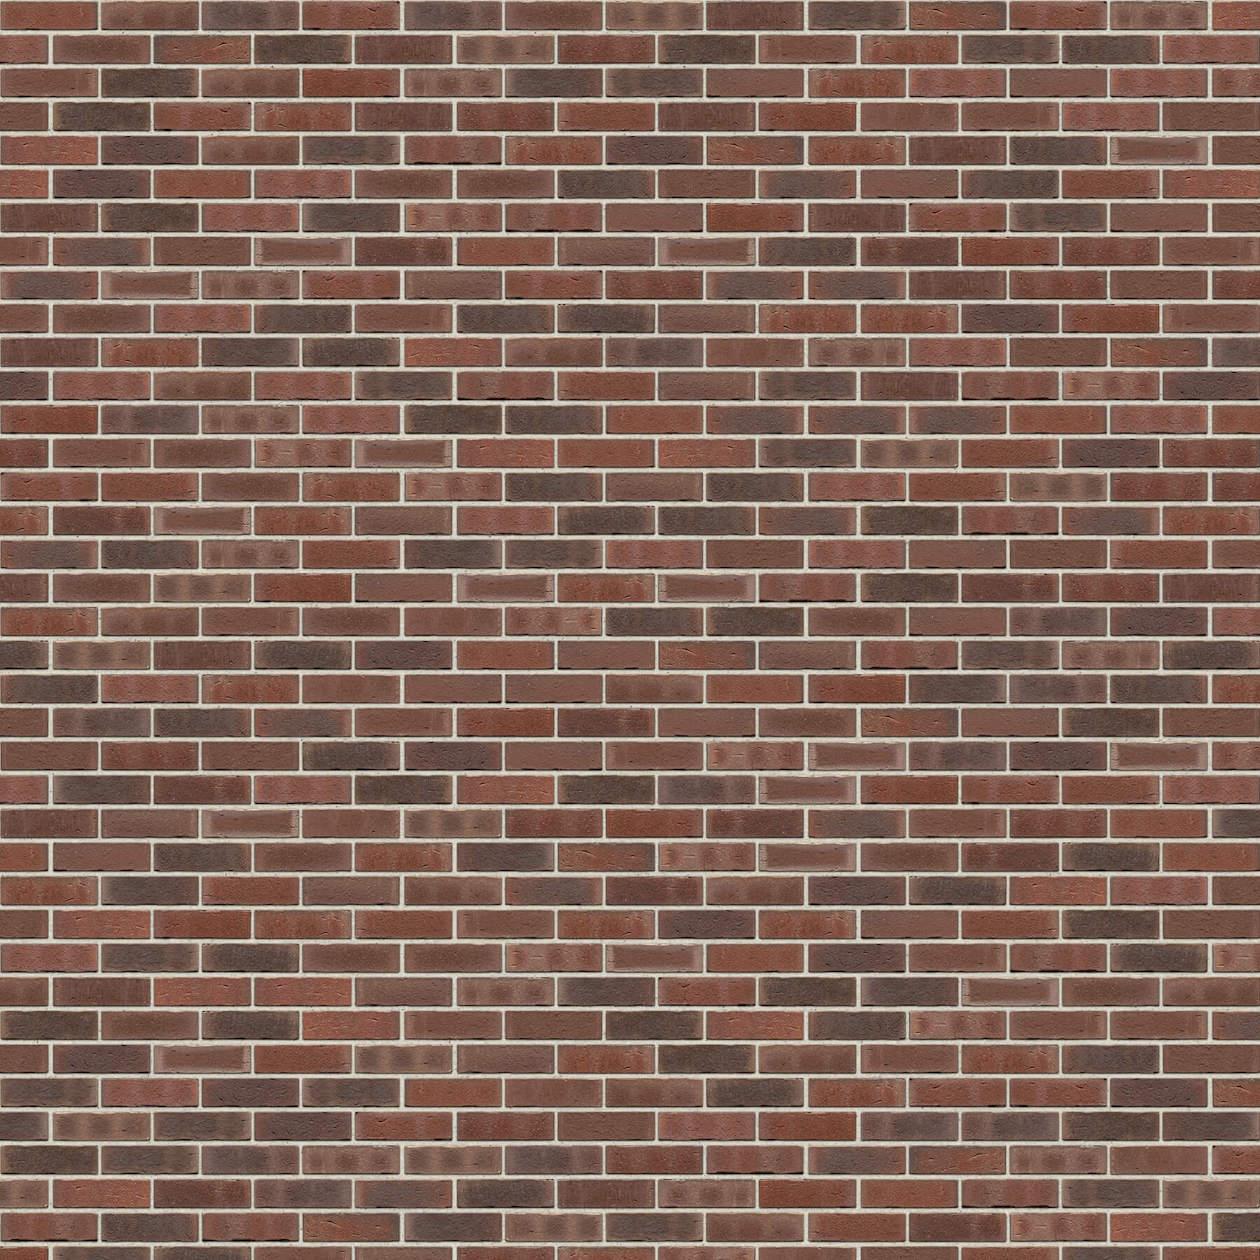 Puna-cigla-FeldHaus-Klinker-brick-house-nf-k-748-Bela Fuga